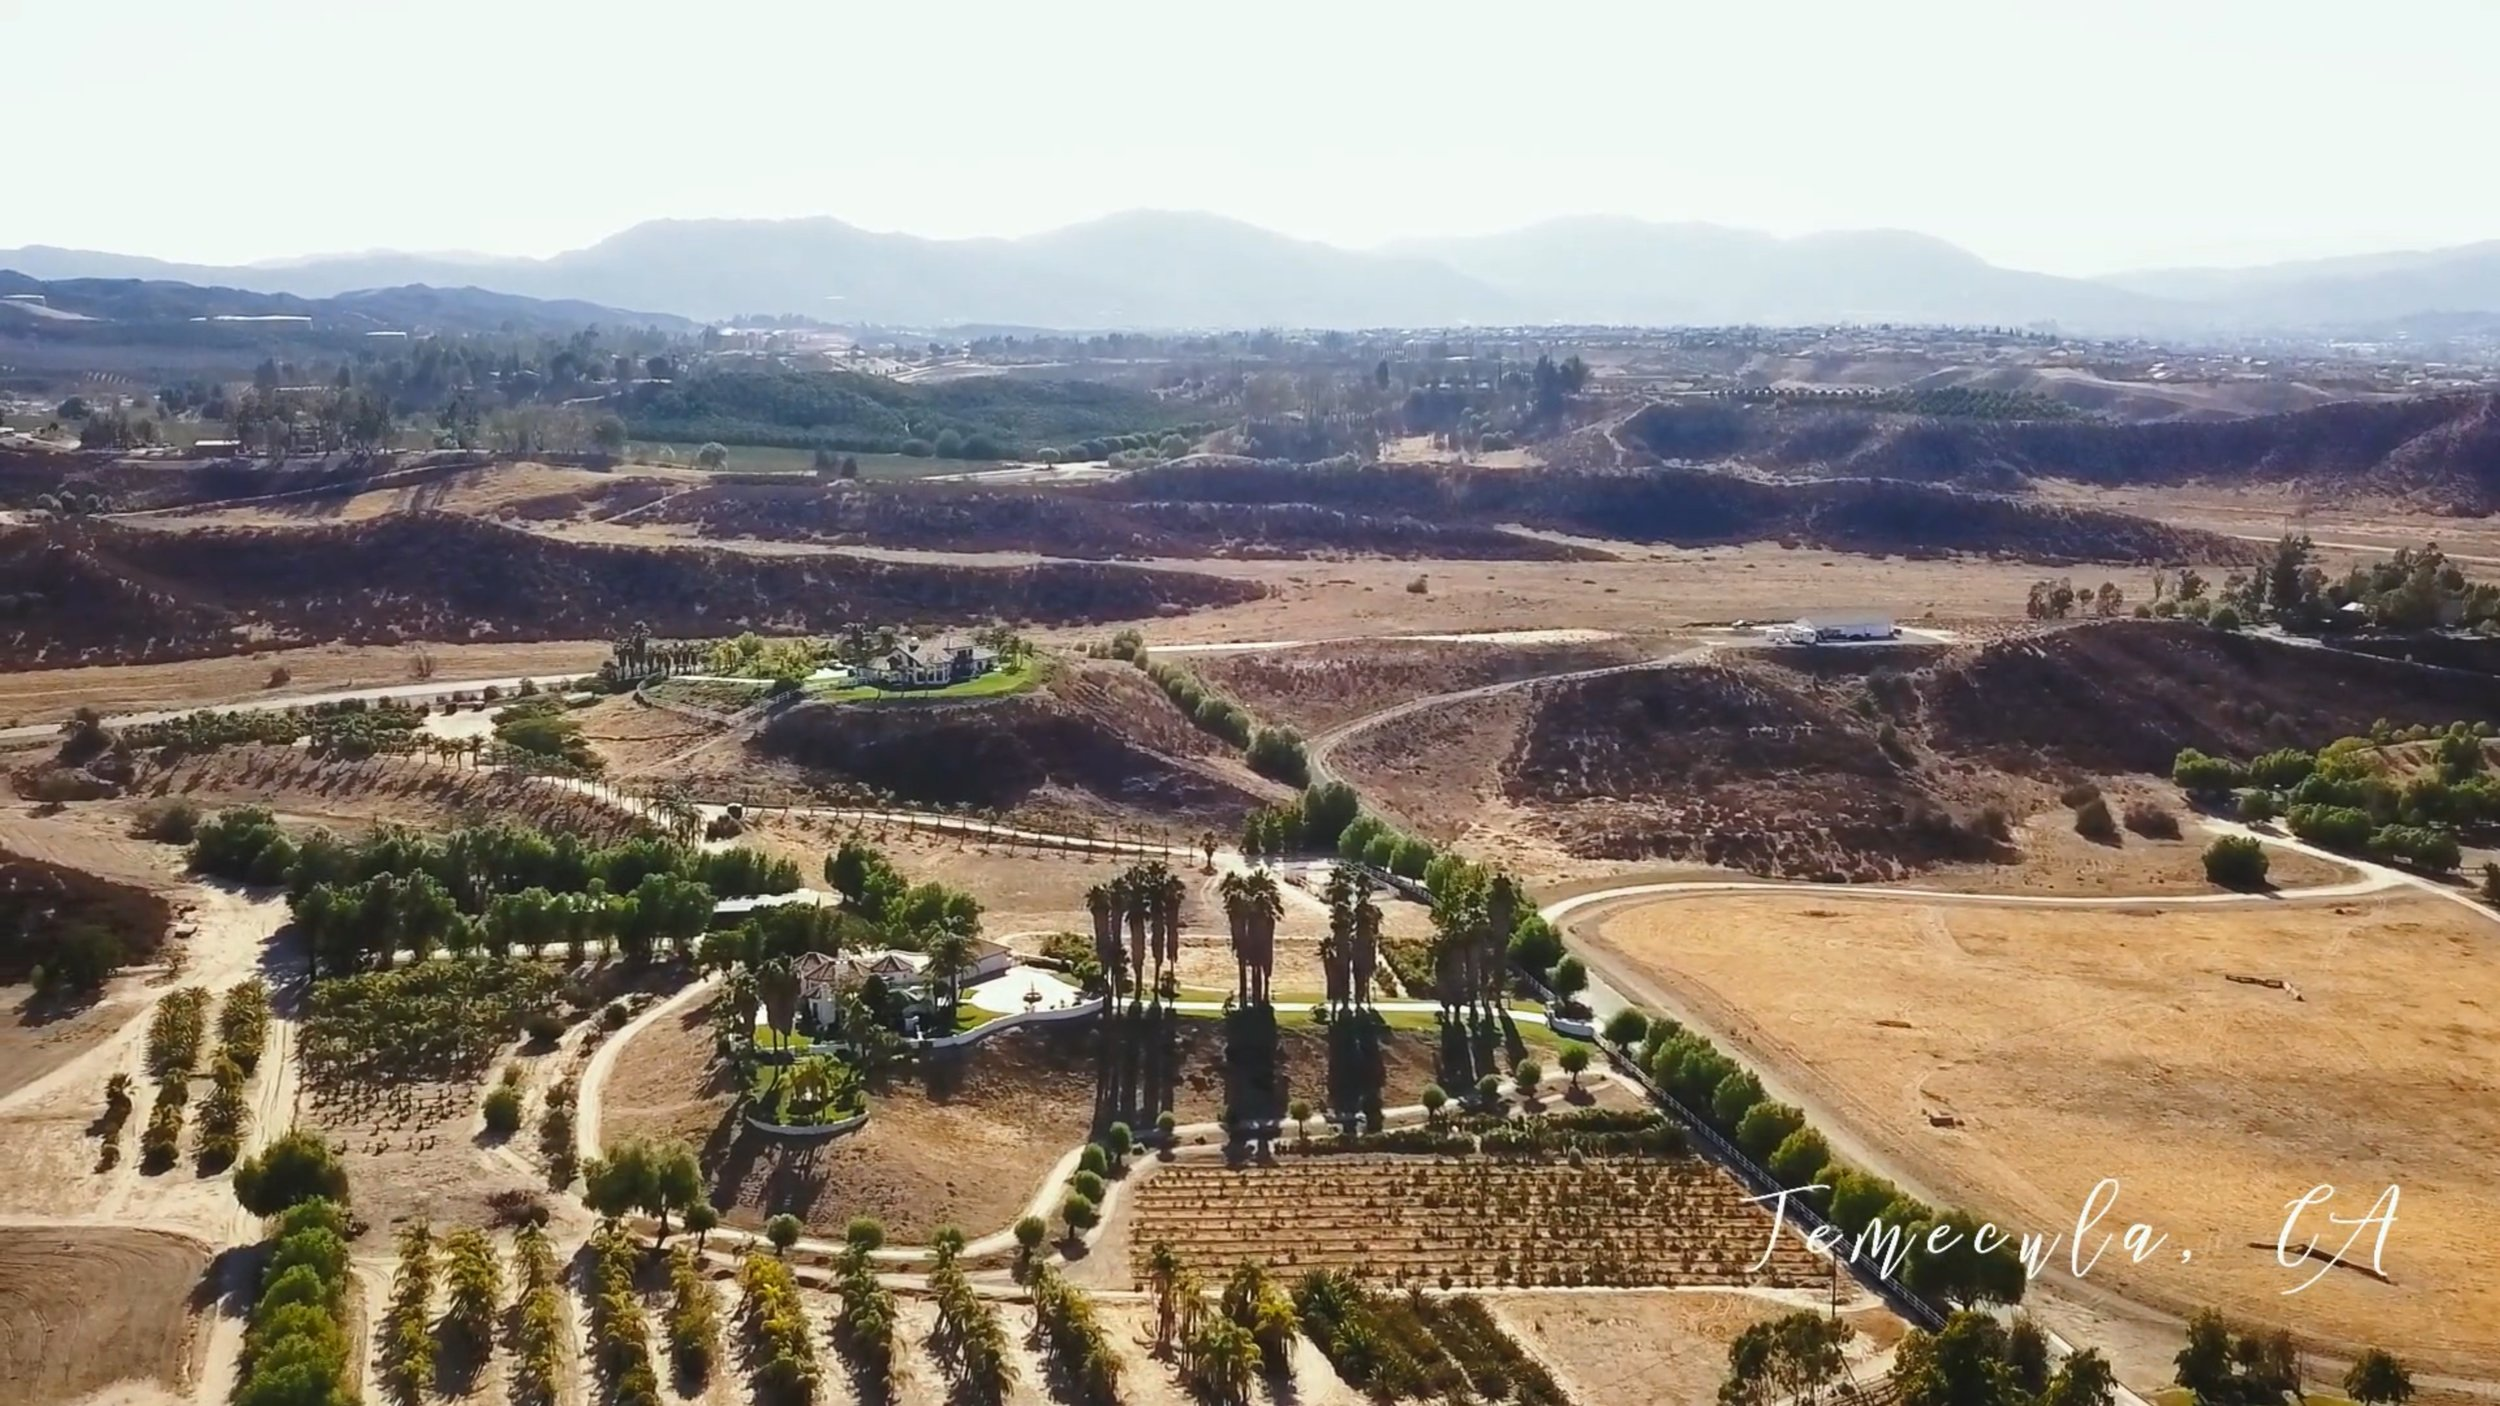 Aerial drone footage of Temecula, CA